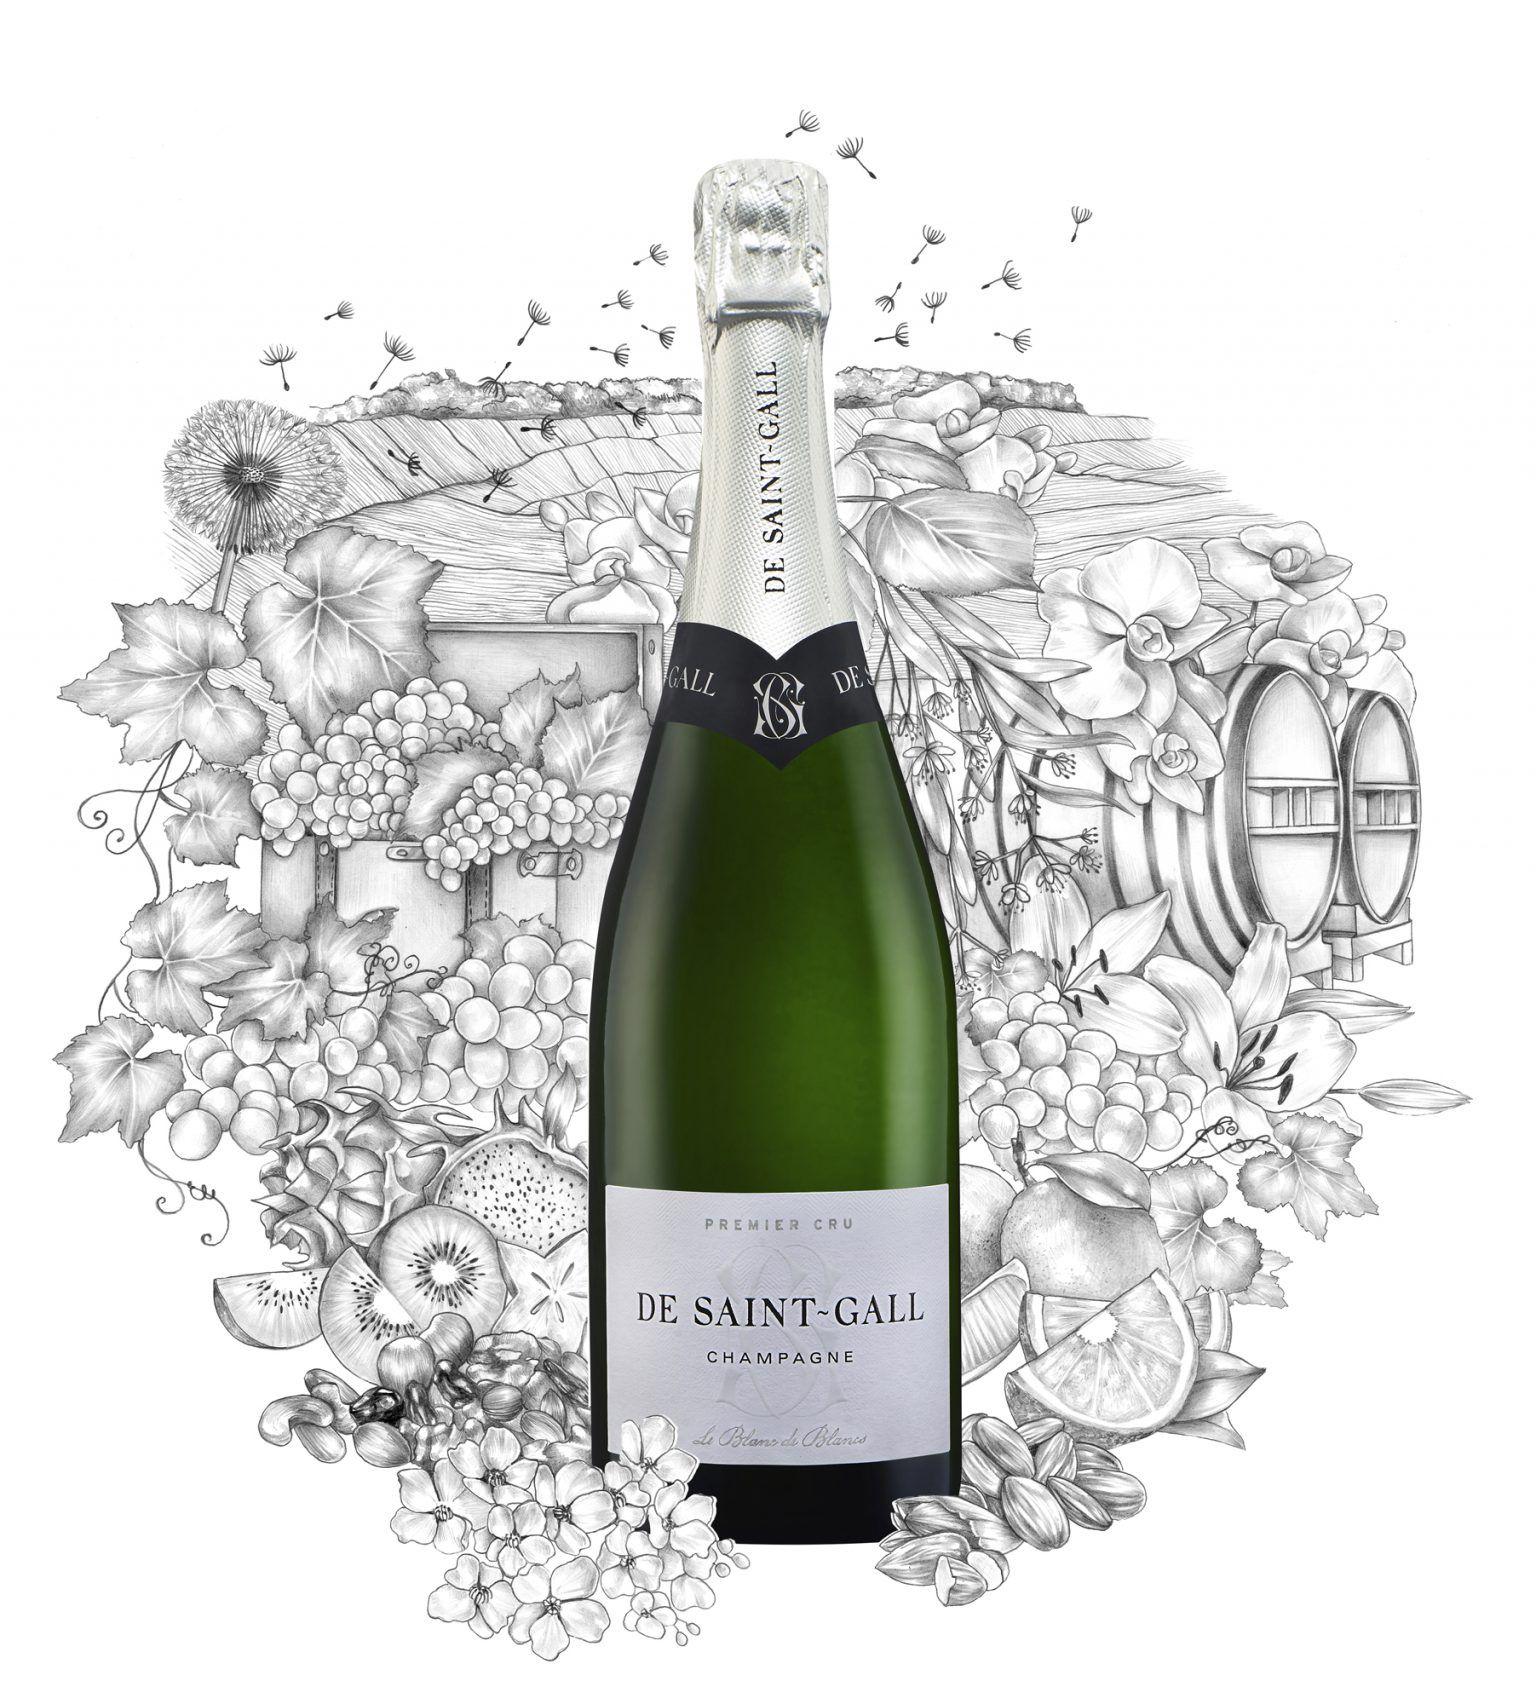 Champagne Blanc de Blancs Chardonnay De Saint-Gall